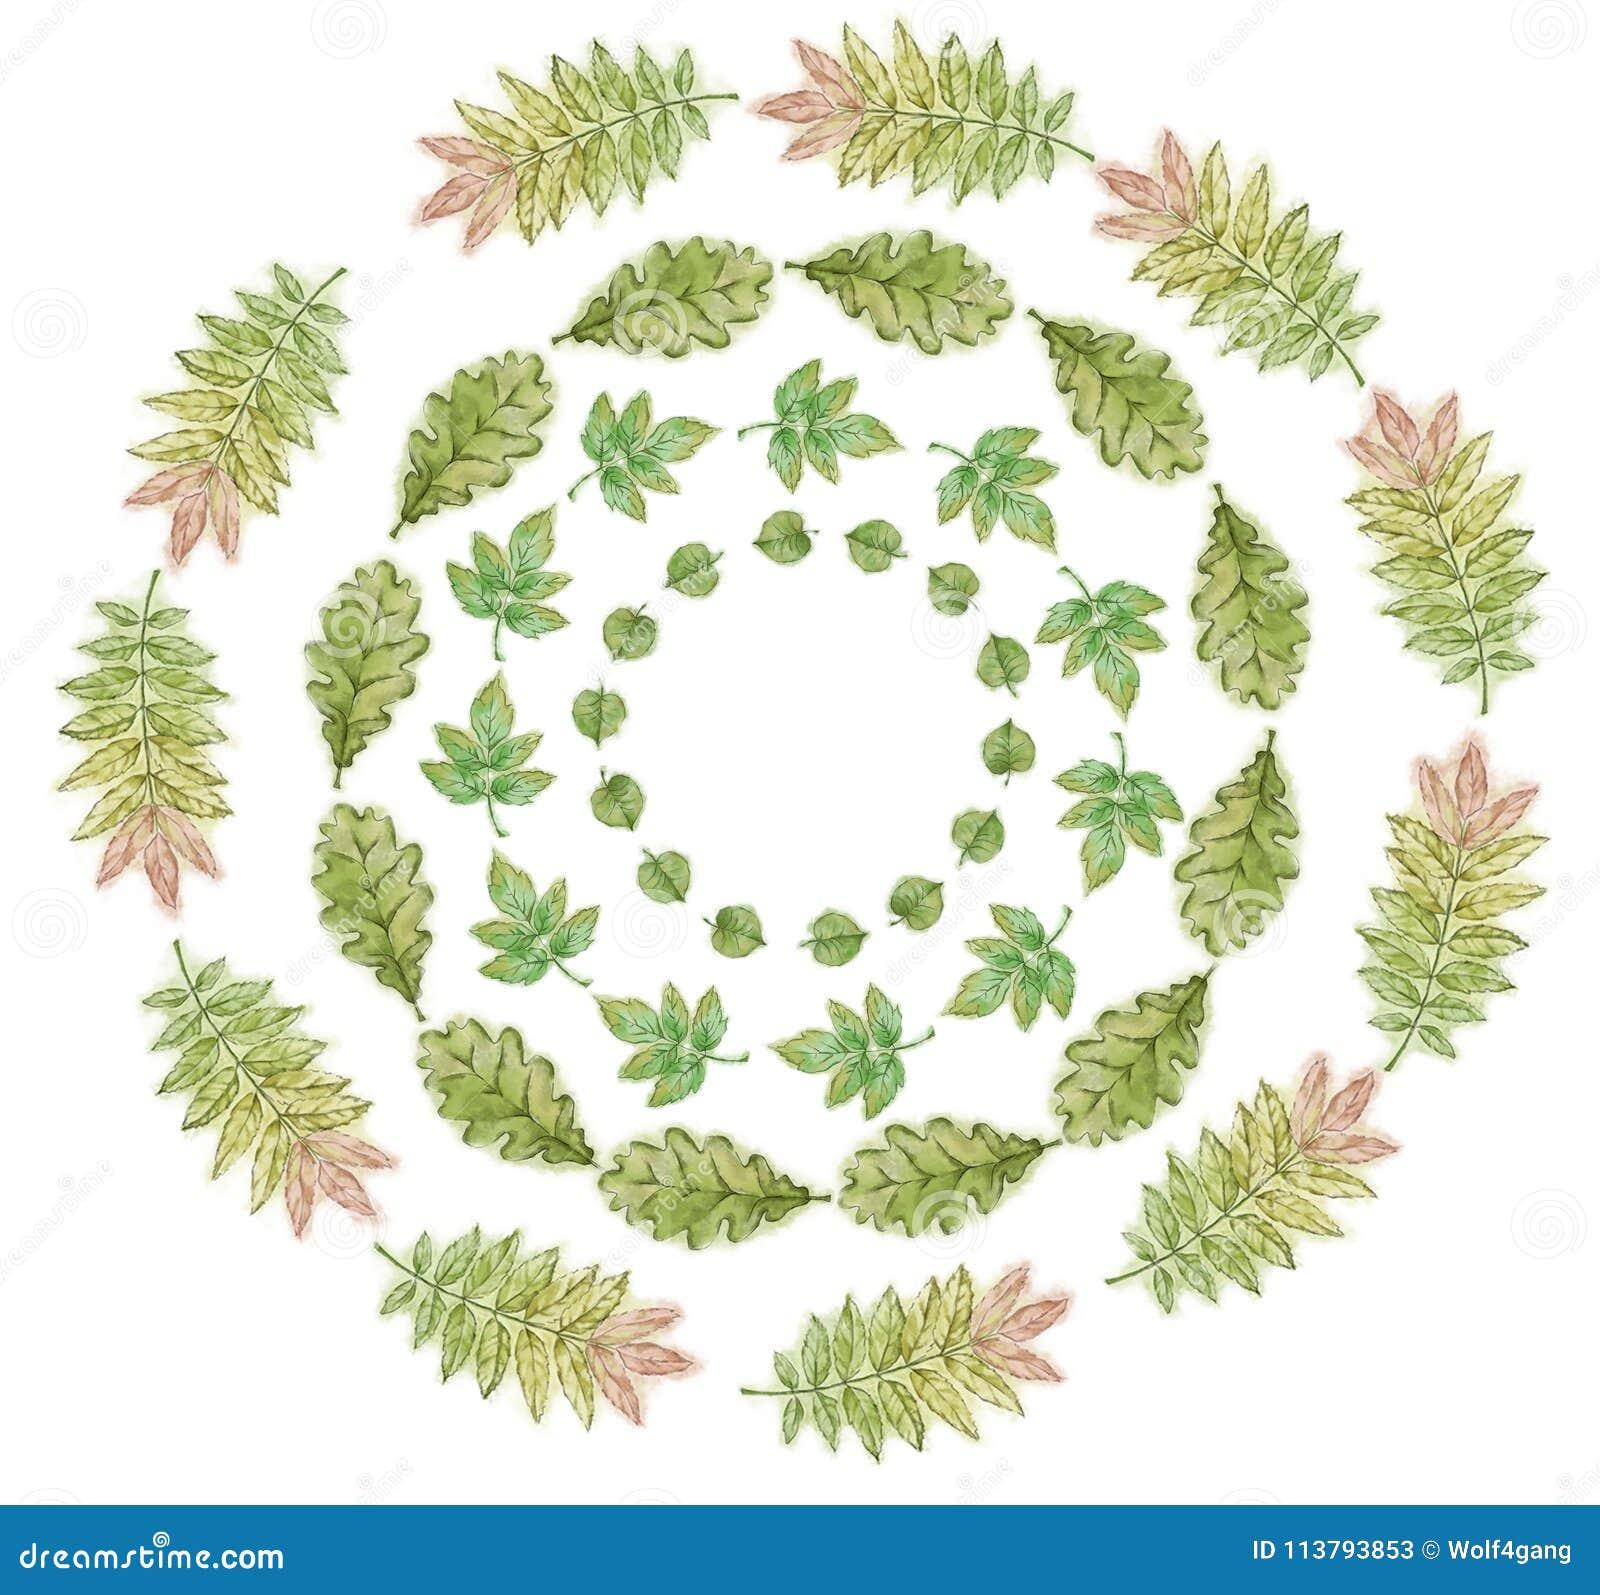 Set Of Summer Leaf Wreaths Hand Painted In Watercolor. Circular ...